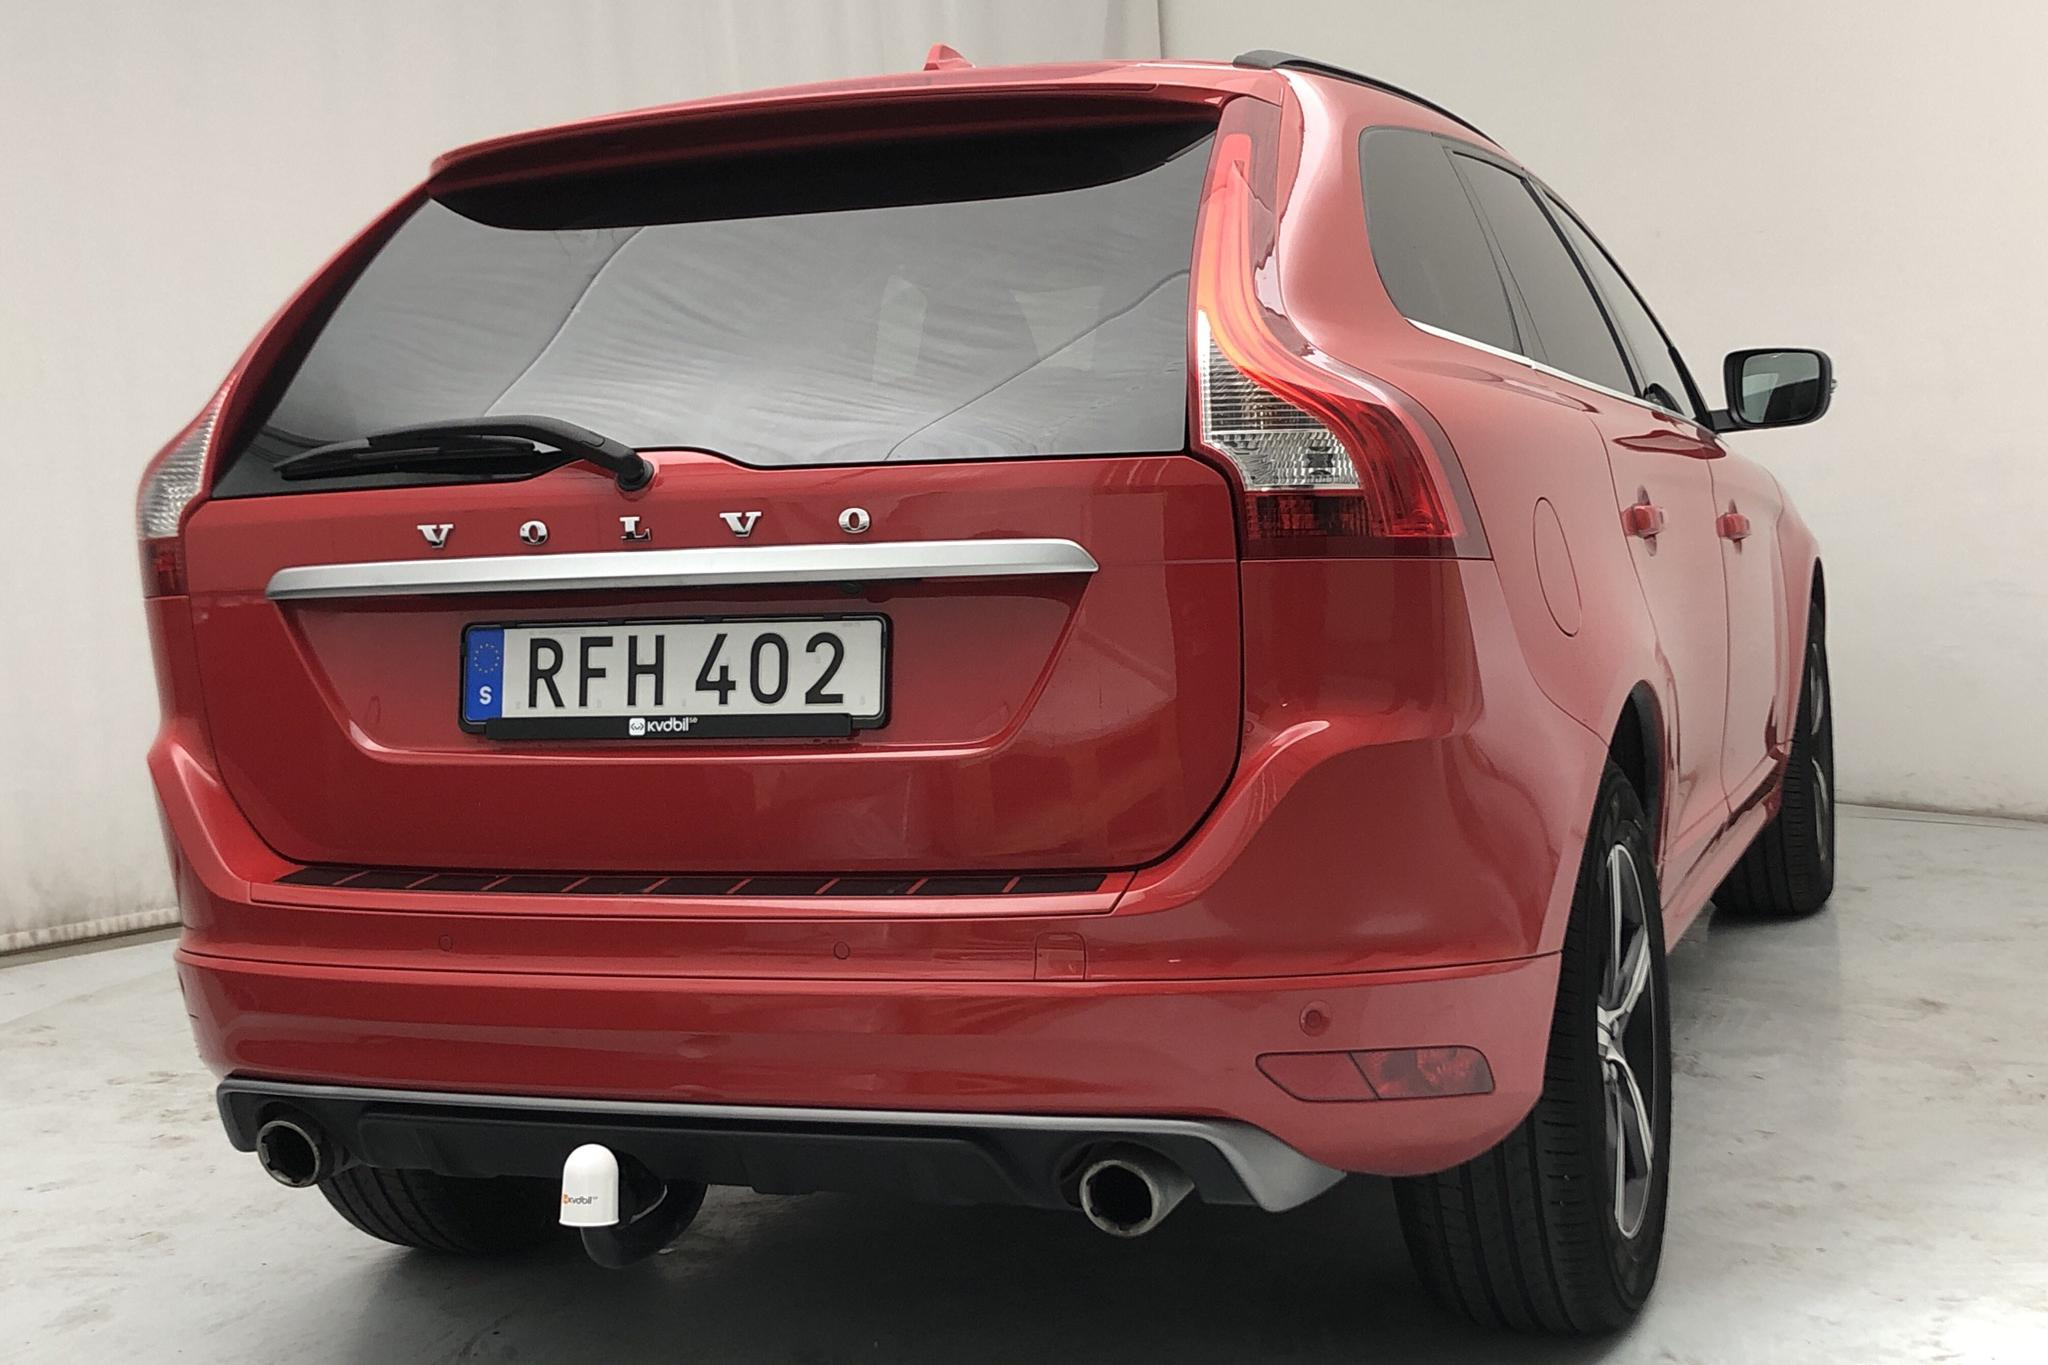 Volvo XC60 D4 AWD (190hk) - 10 421 mil - Automat - röd - 2017